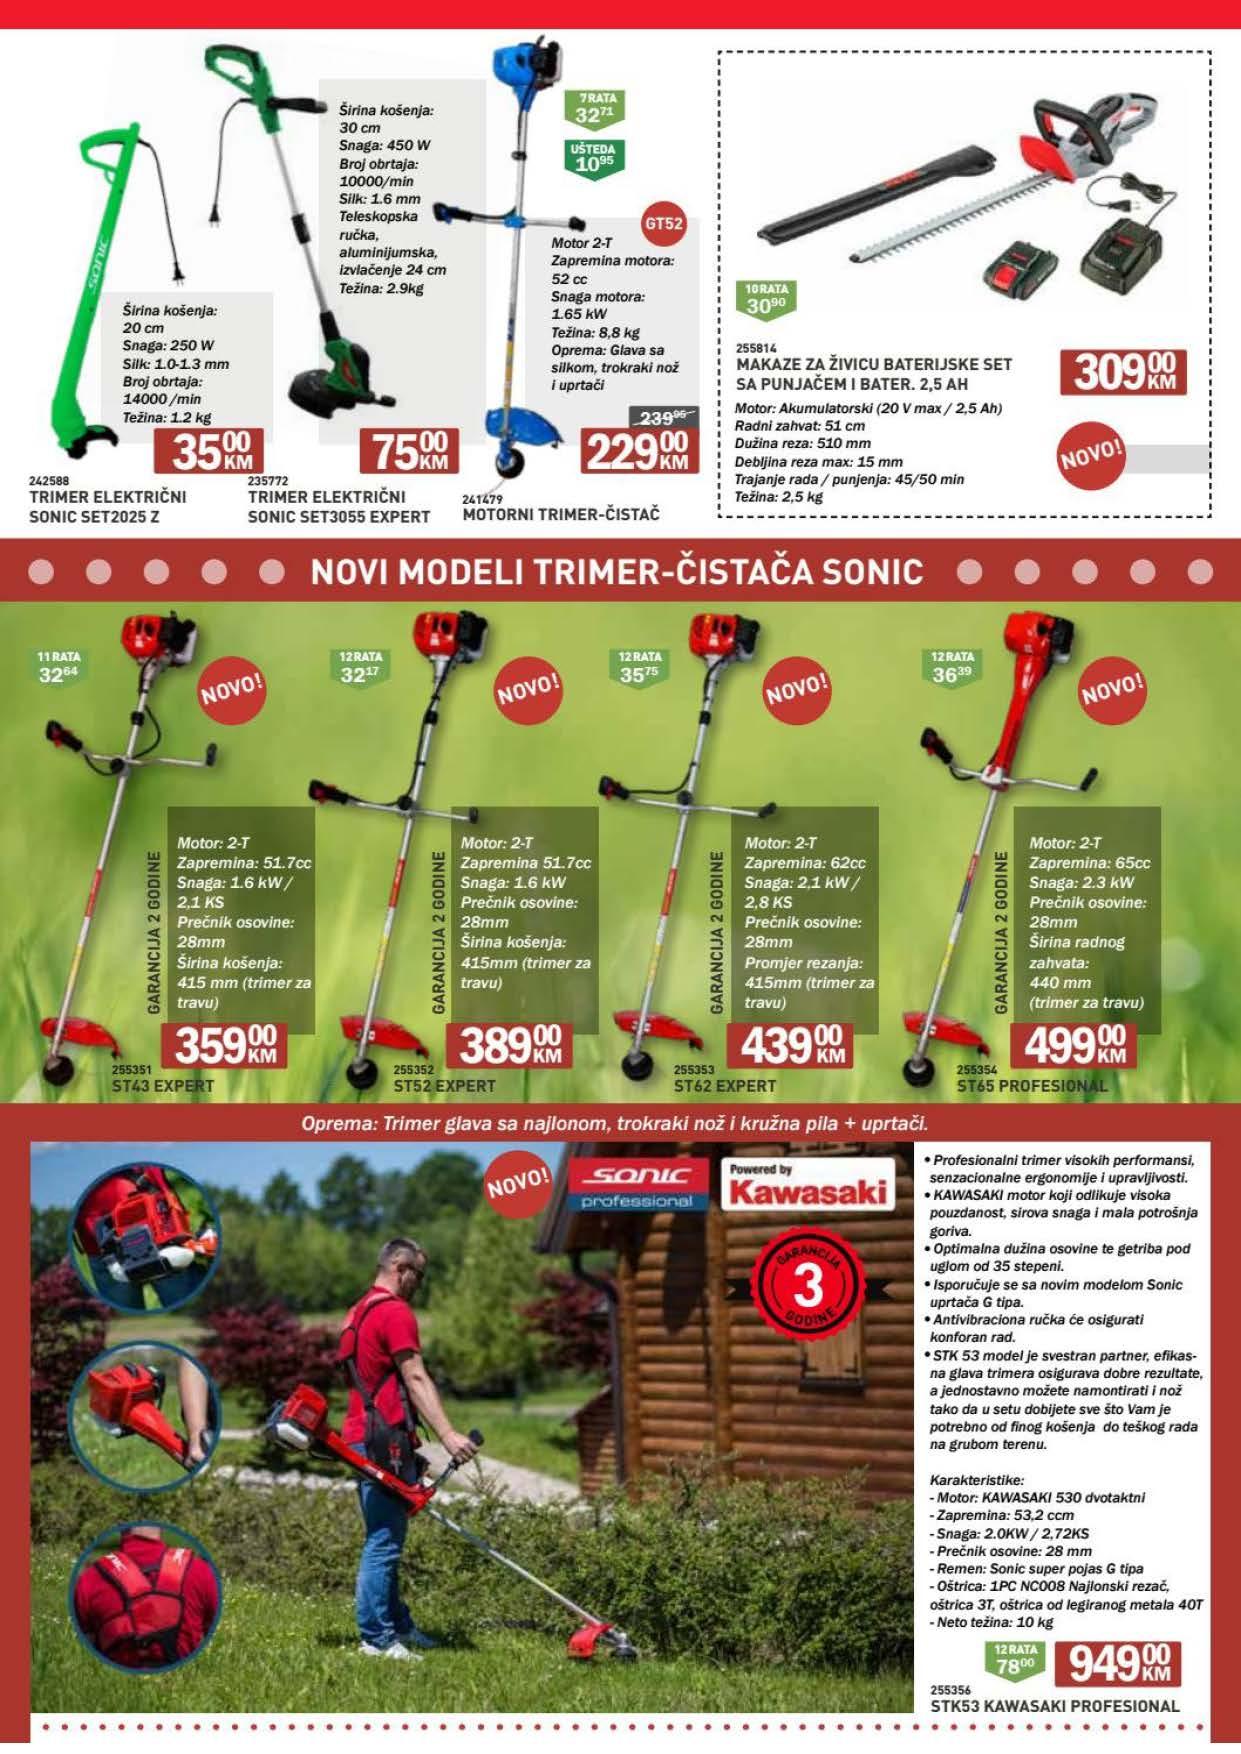 Verno Agromehanika Akcijski Katalog JUN 2021 eKatalozi.com PR Page 02